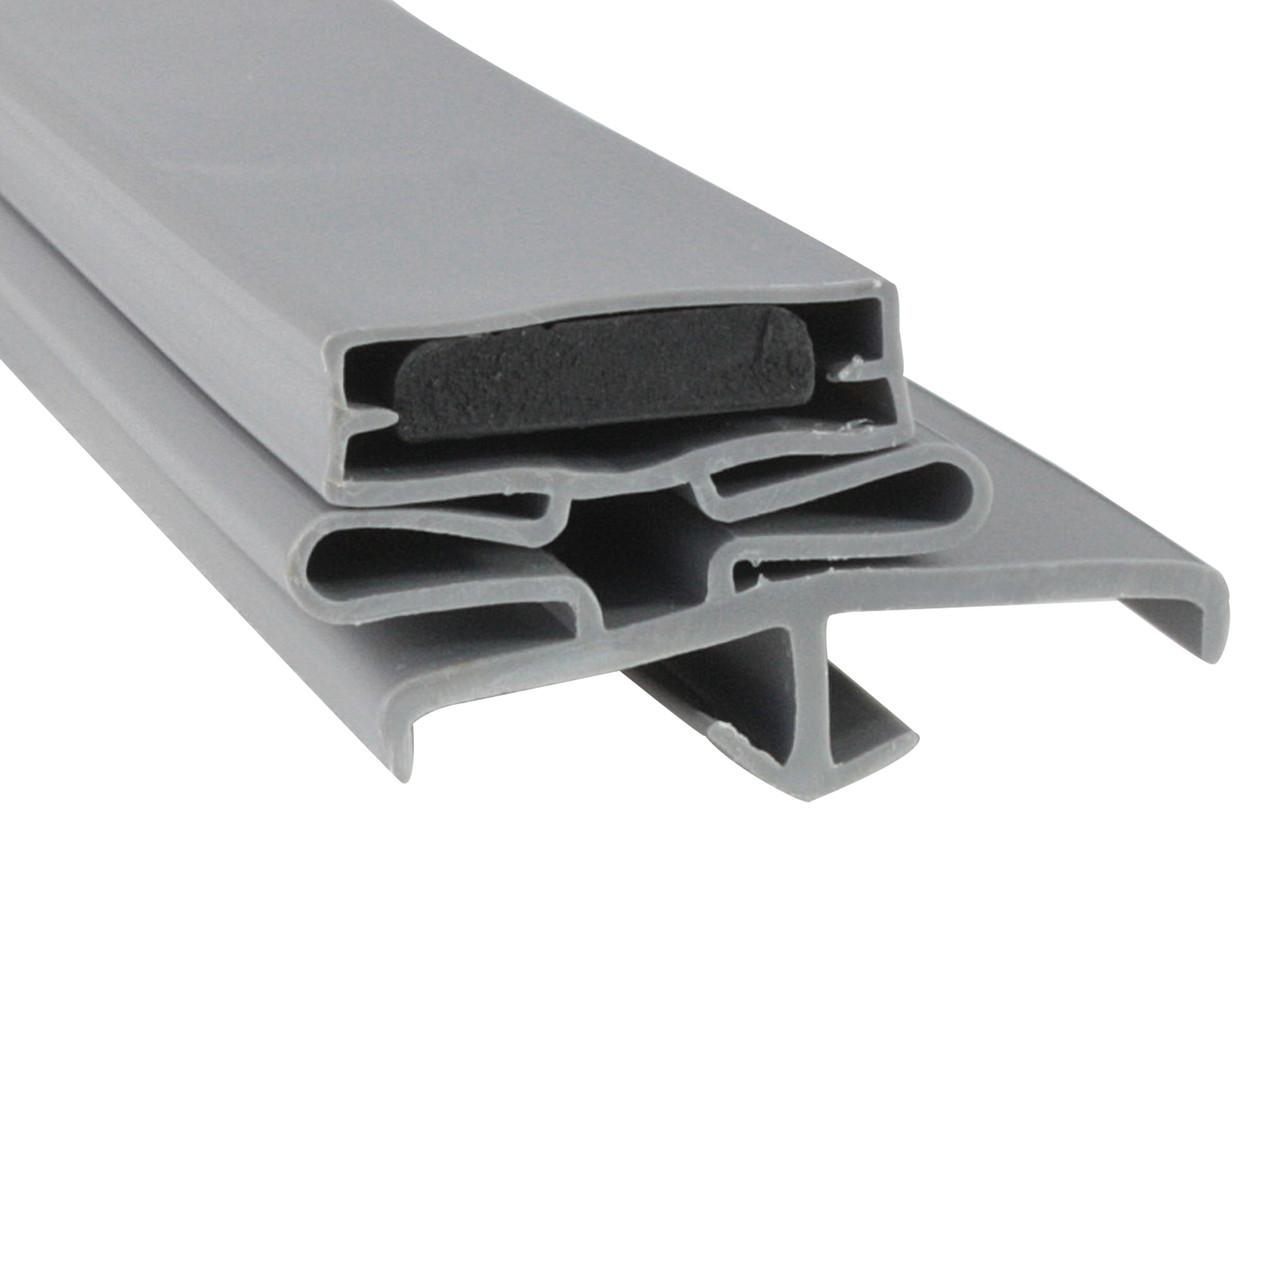 Delfield Door Gasket Profile 168 15 7/8 x 33 7/8 -A2.0858